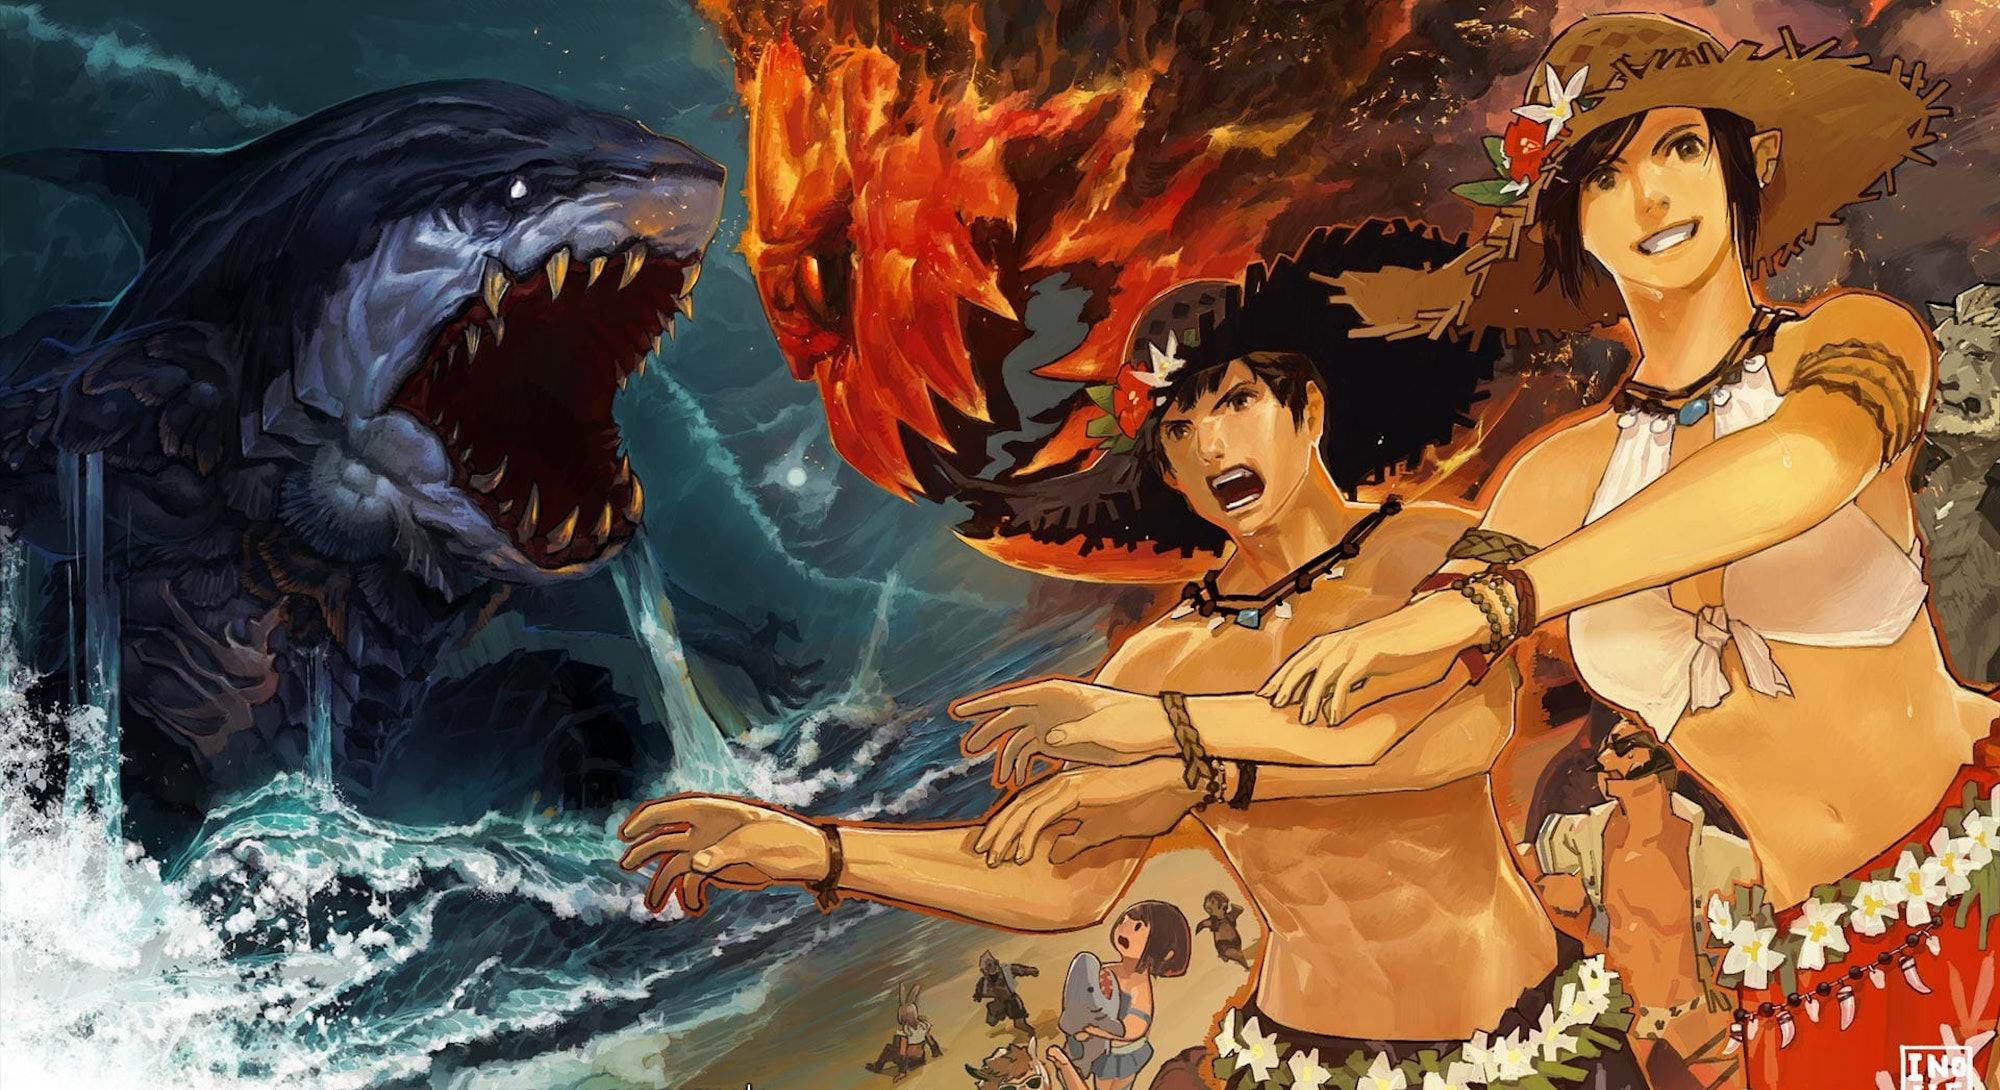 splash art from Final Fantasy 14 Moonfire Faire 2020